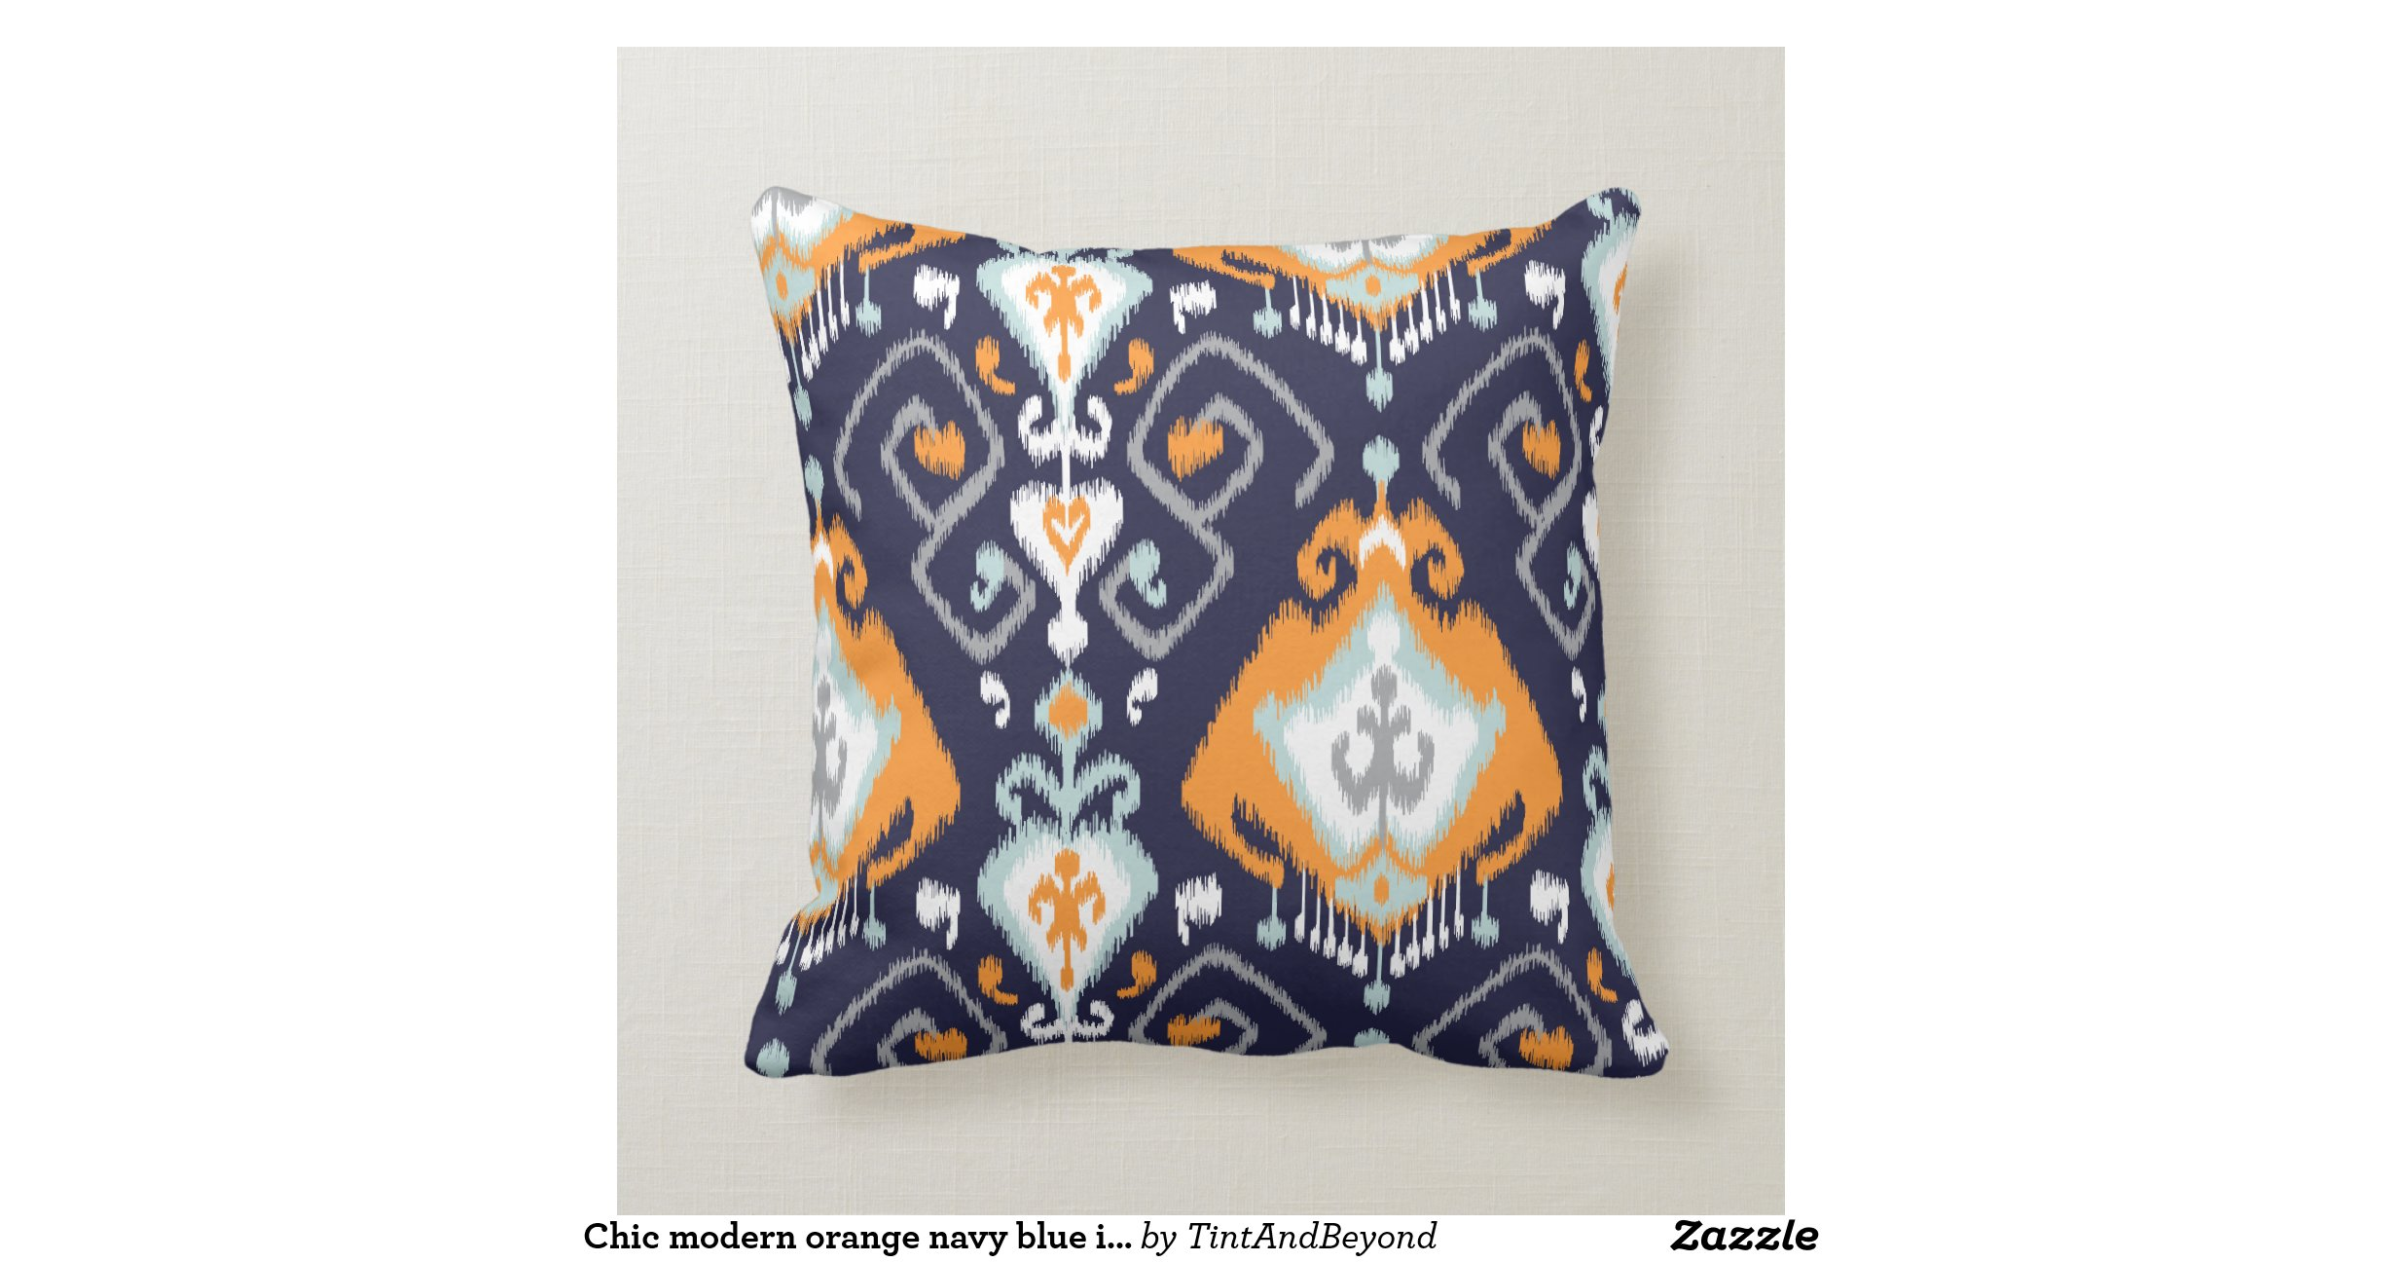 Chic modern orange navy blue ikat tribal pattern pillows Zazzle